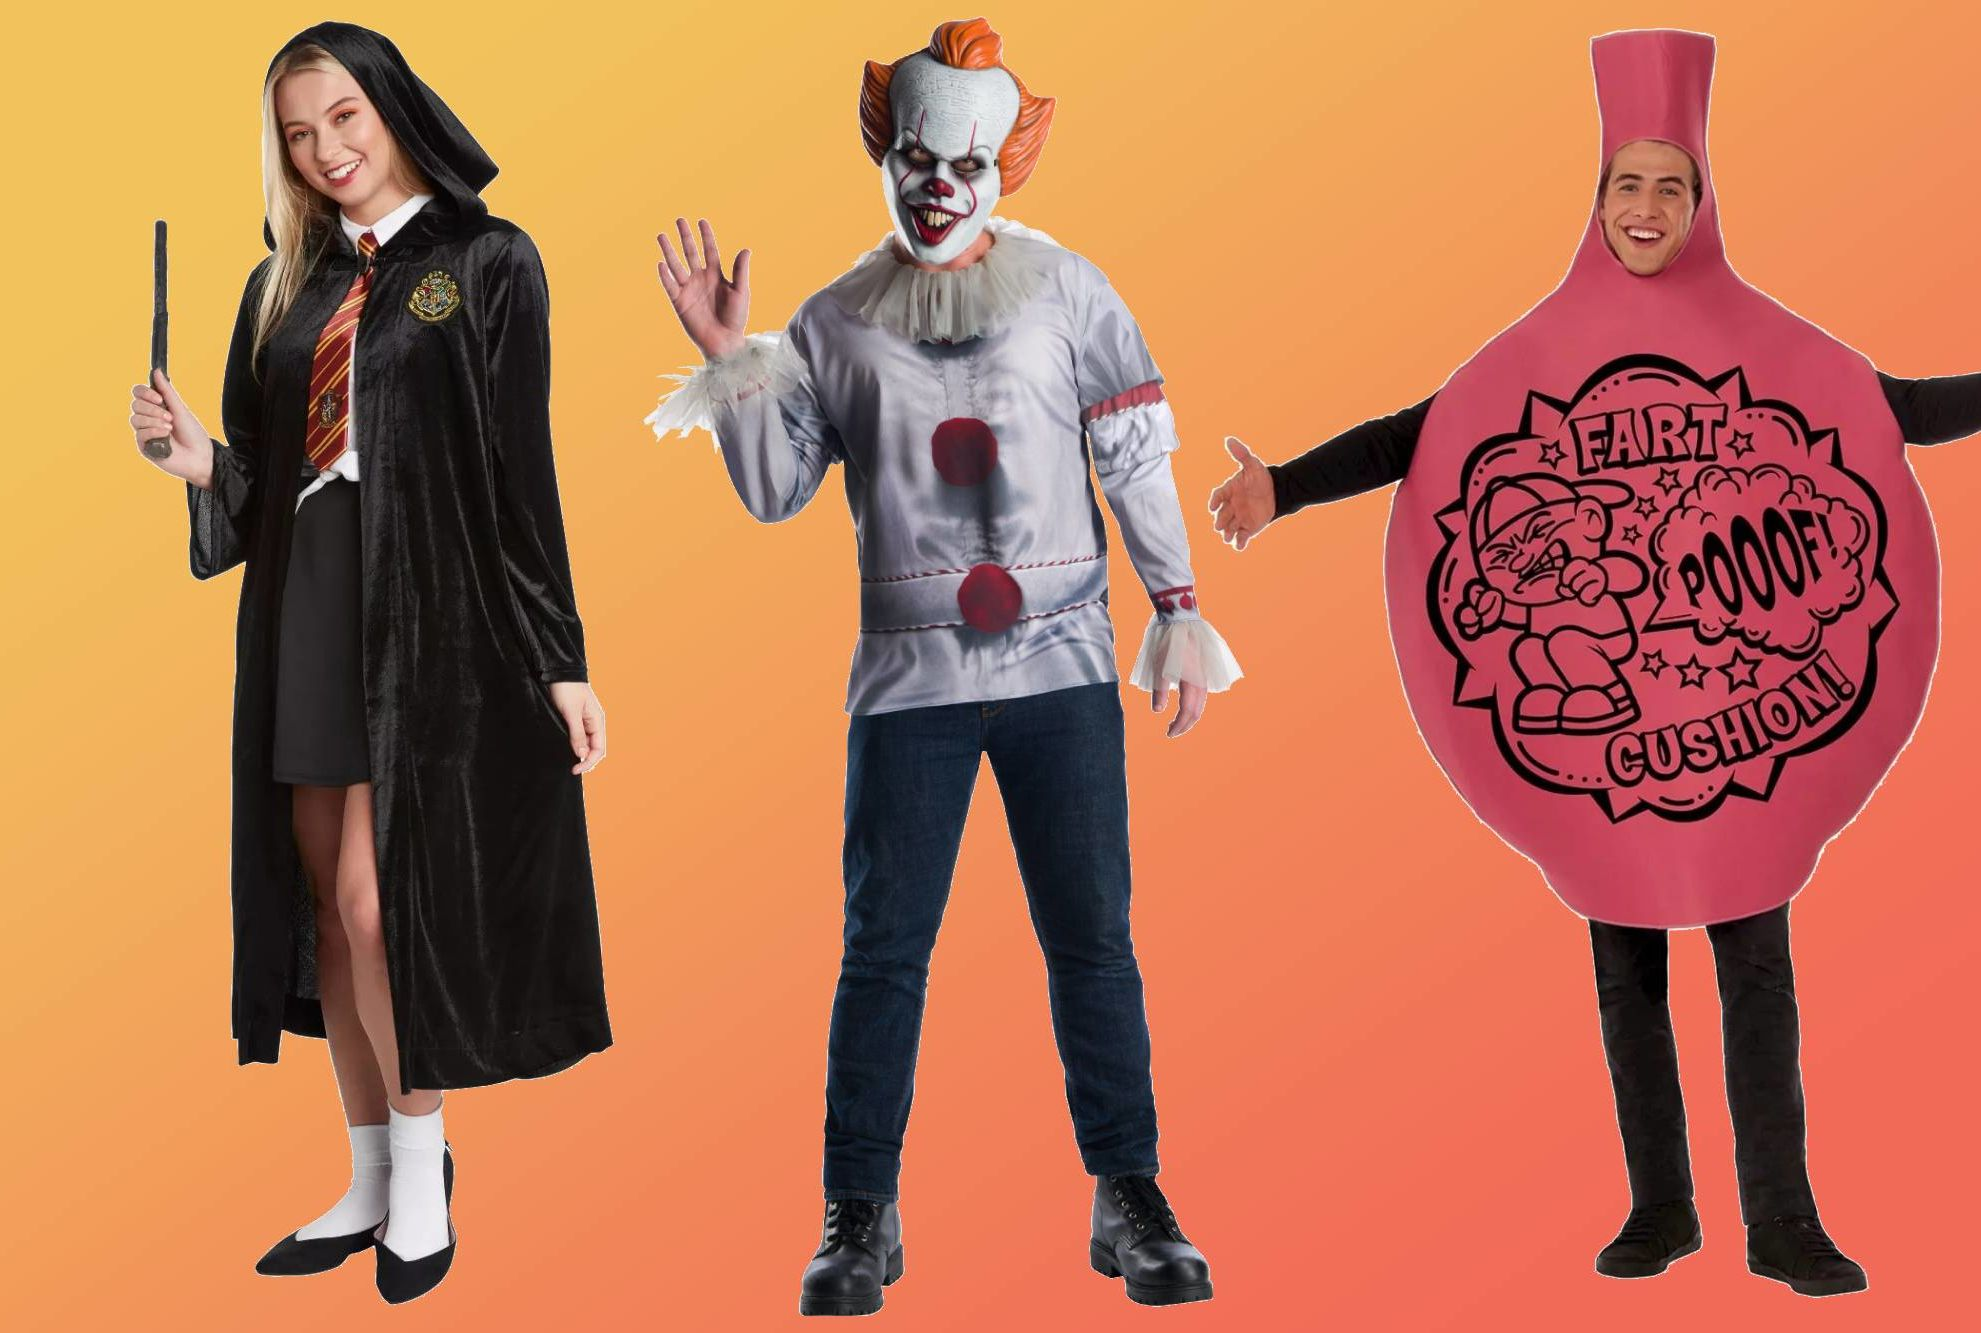 Hashtag Costume Adult Funny Halloween Fancy Dress